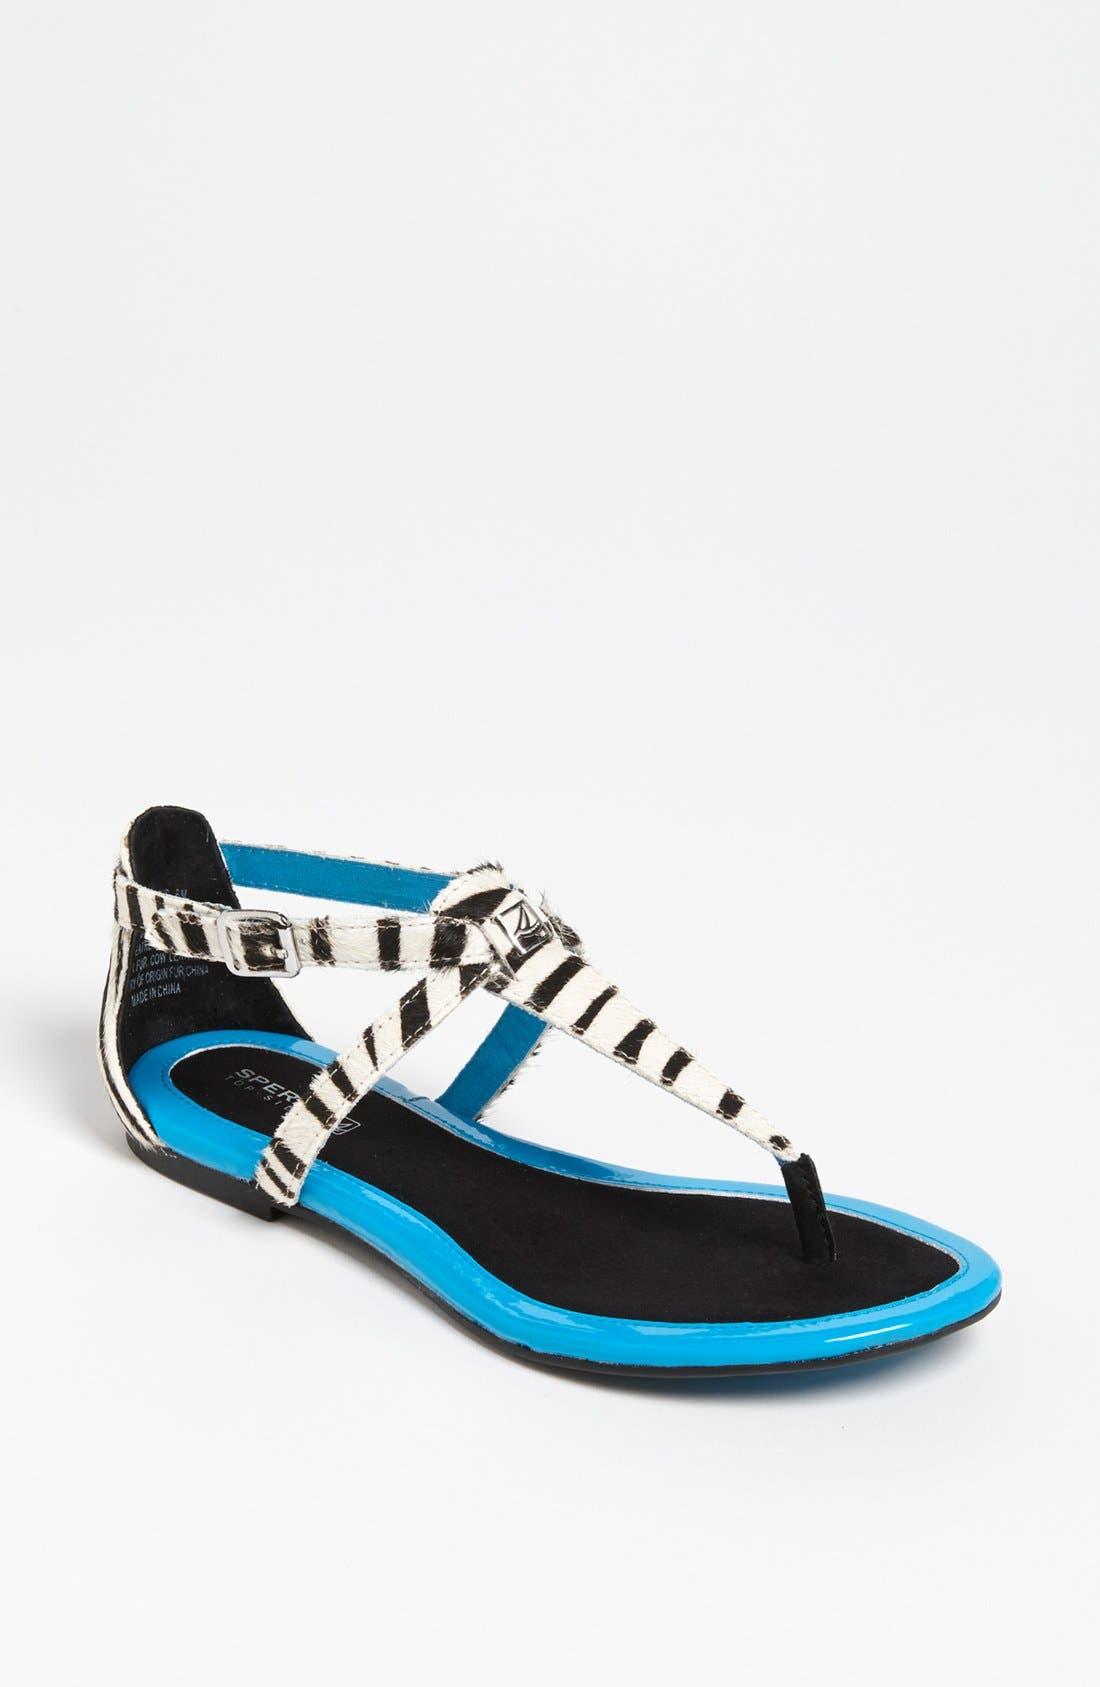 Alternate Image 1 Selected - Sperry Top-Sider® 'Summerlin' Sandal